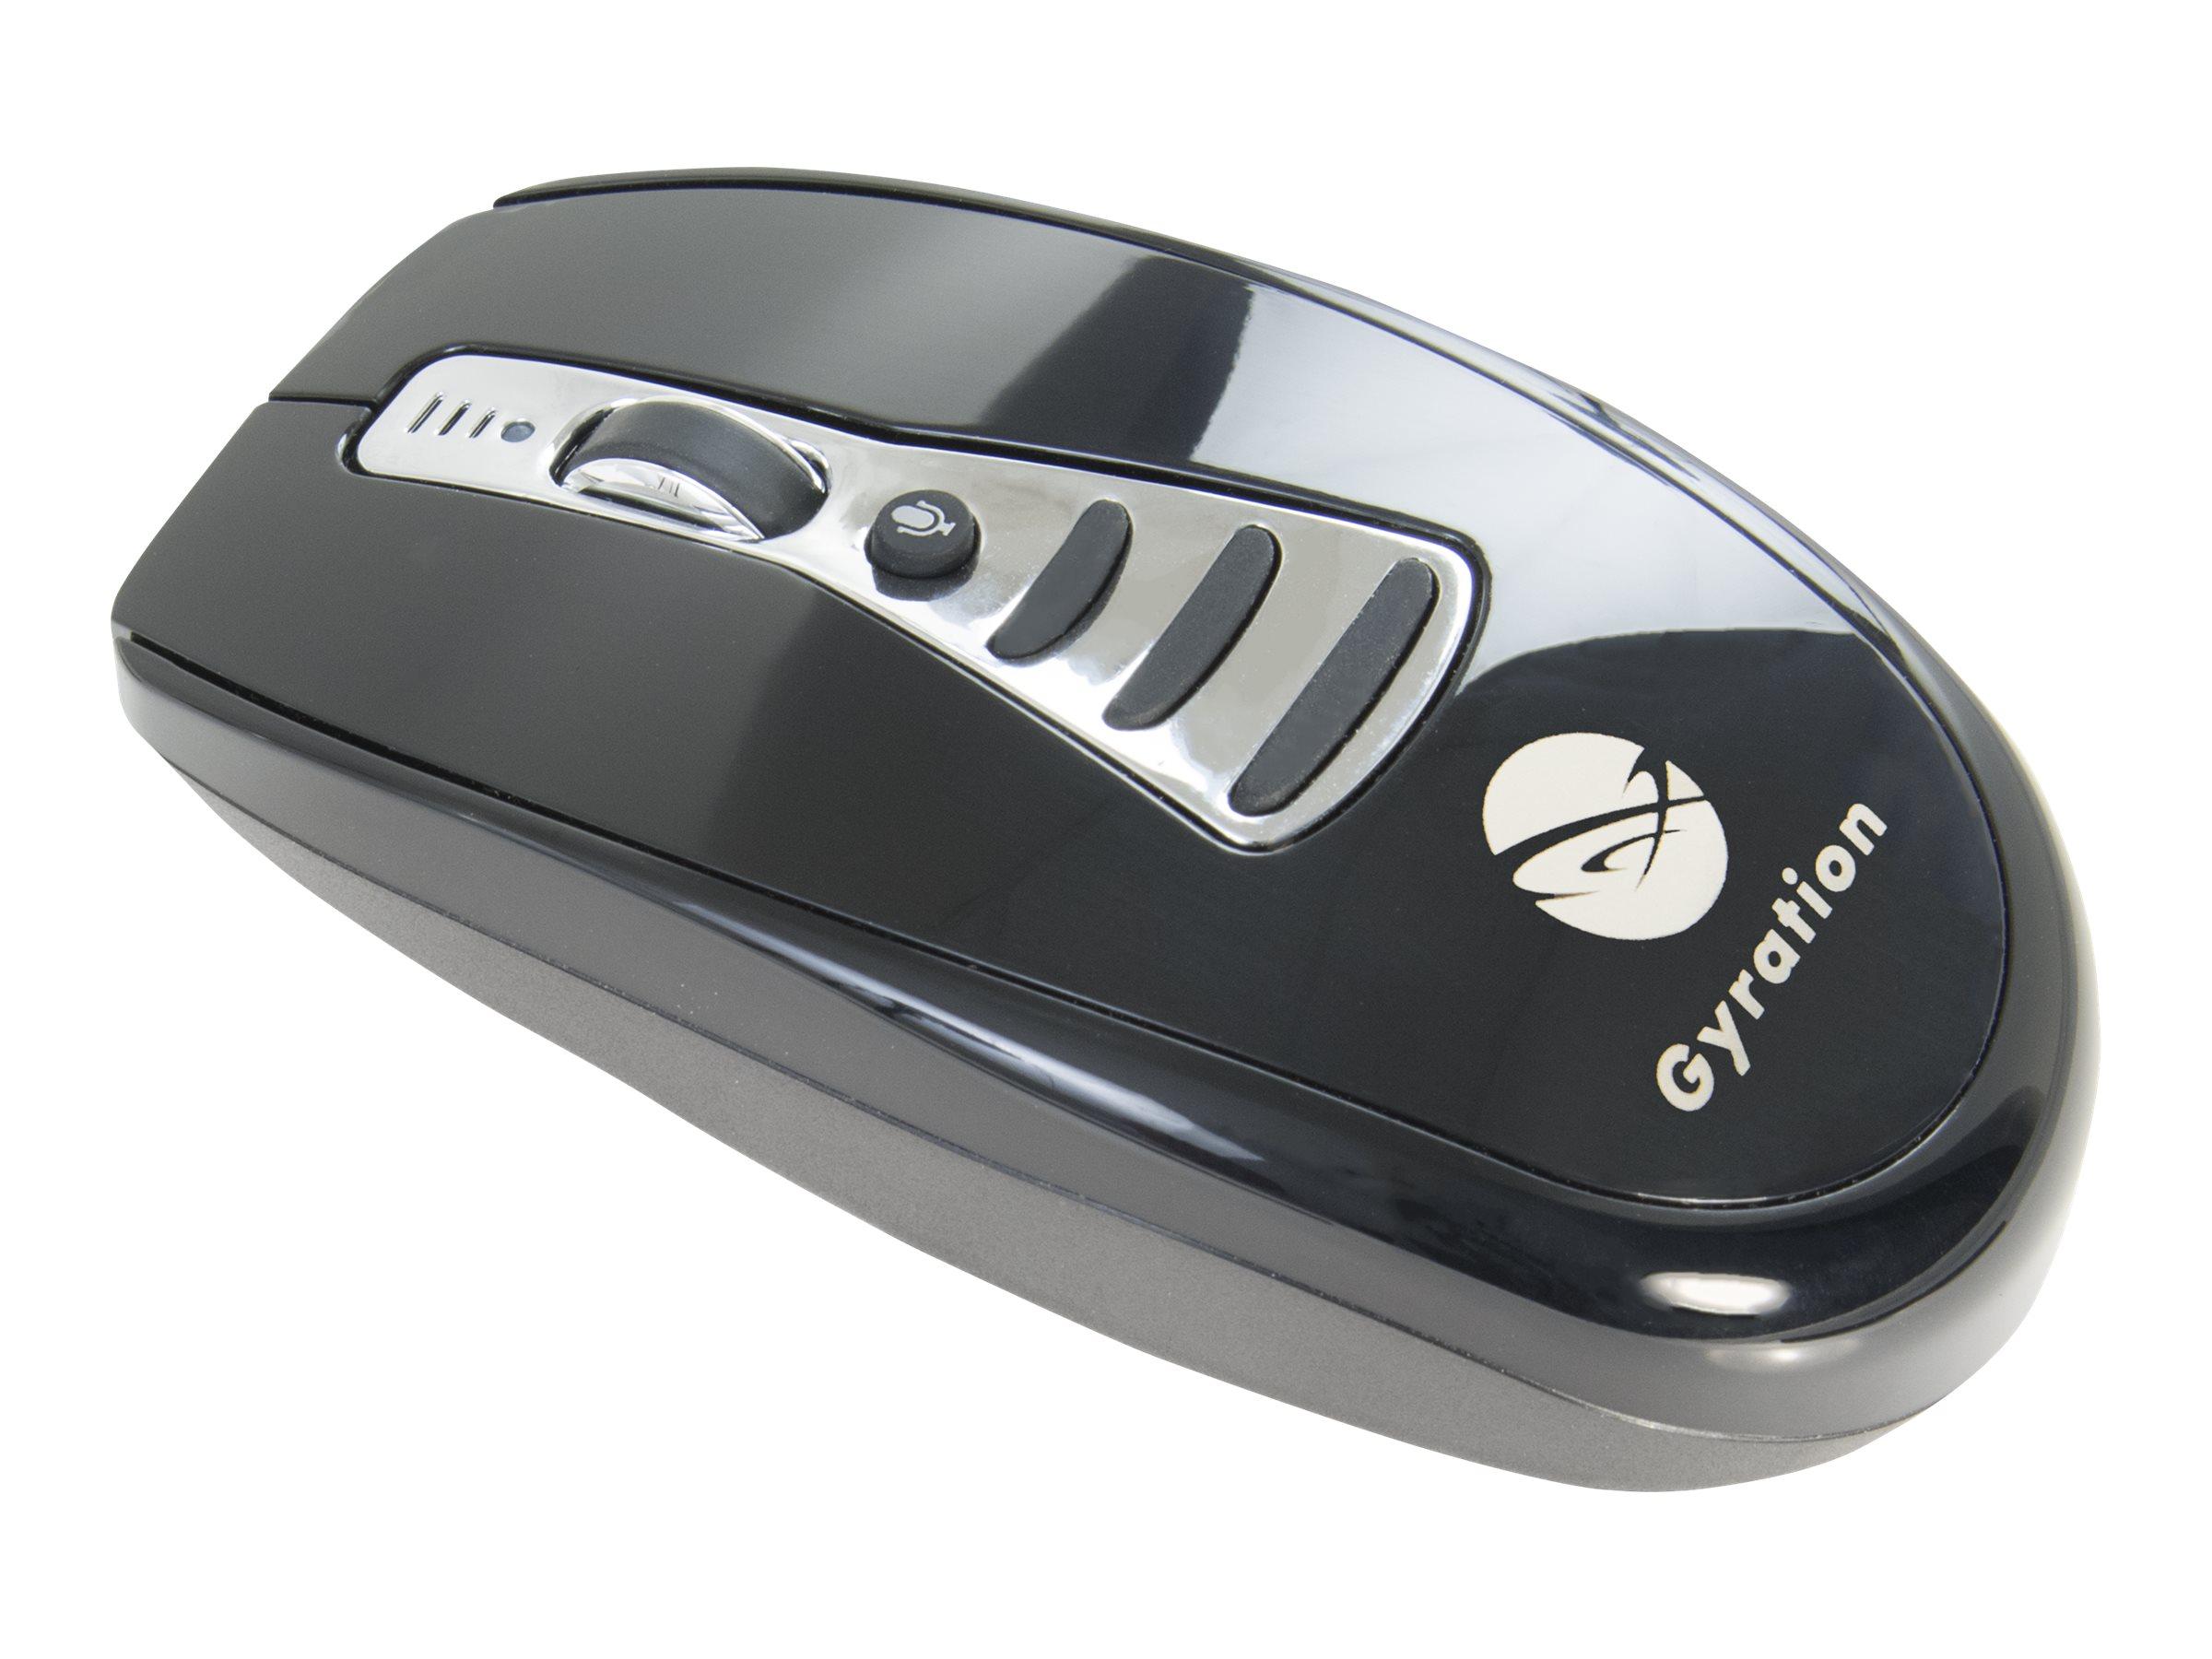 Gyration Air Mouse Voice - Maus - gyroskopisch